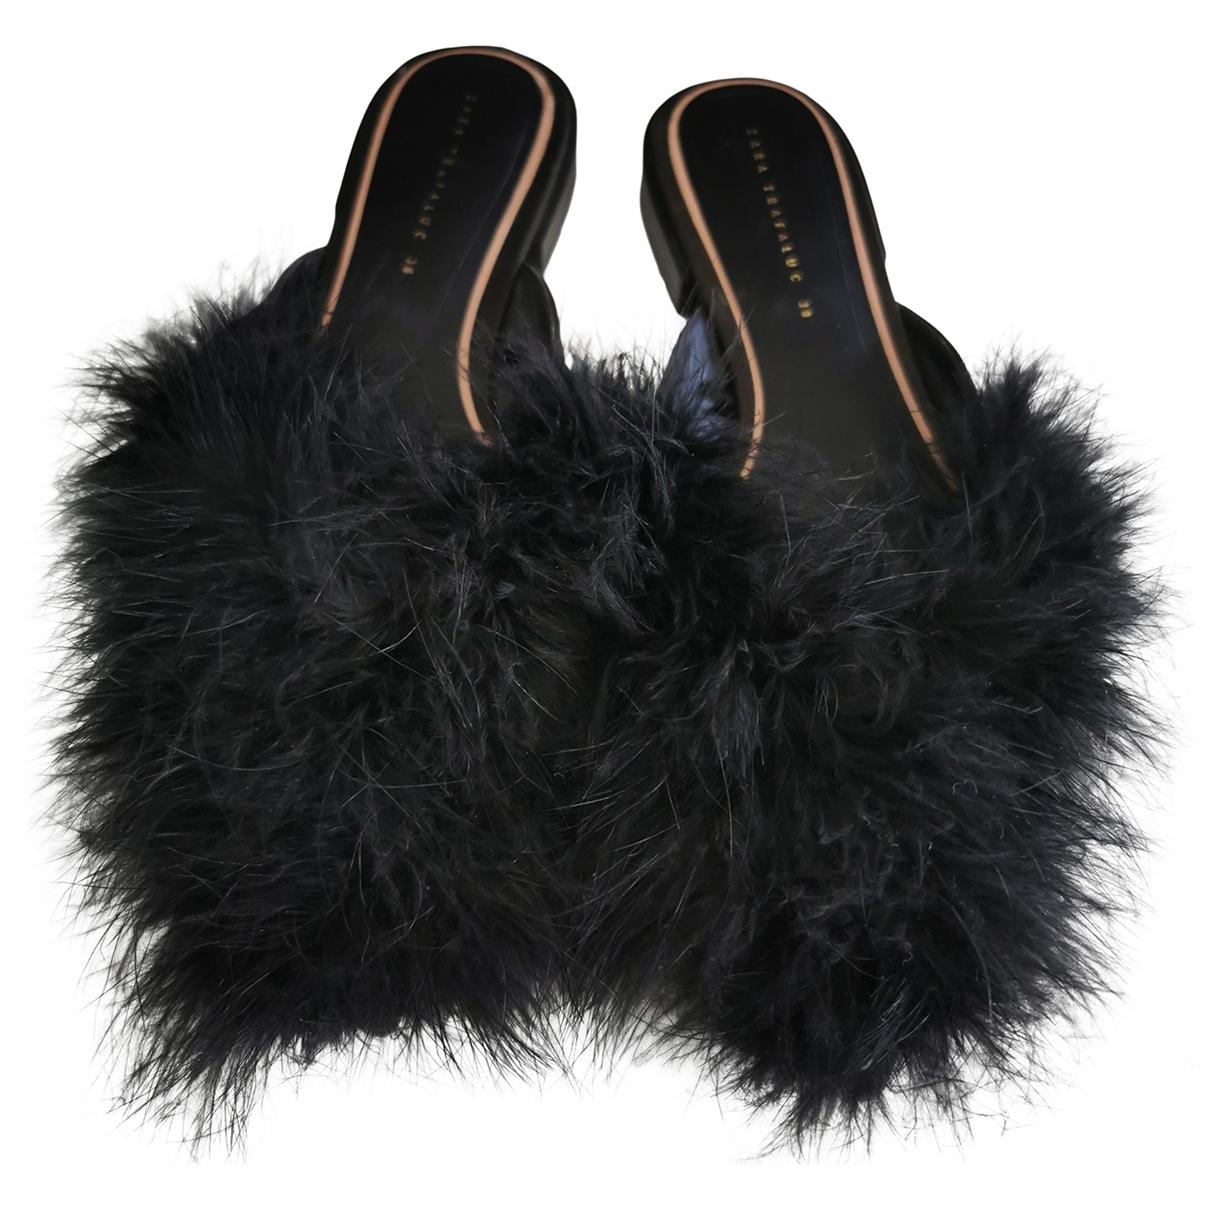 Zara \N Black Faux fur Mules & Clogs for Women 38 EU